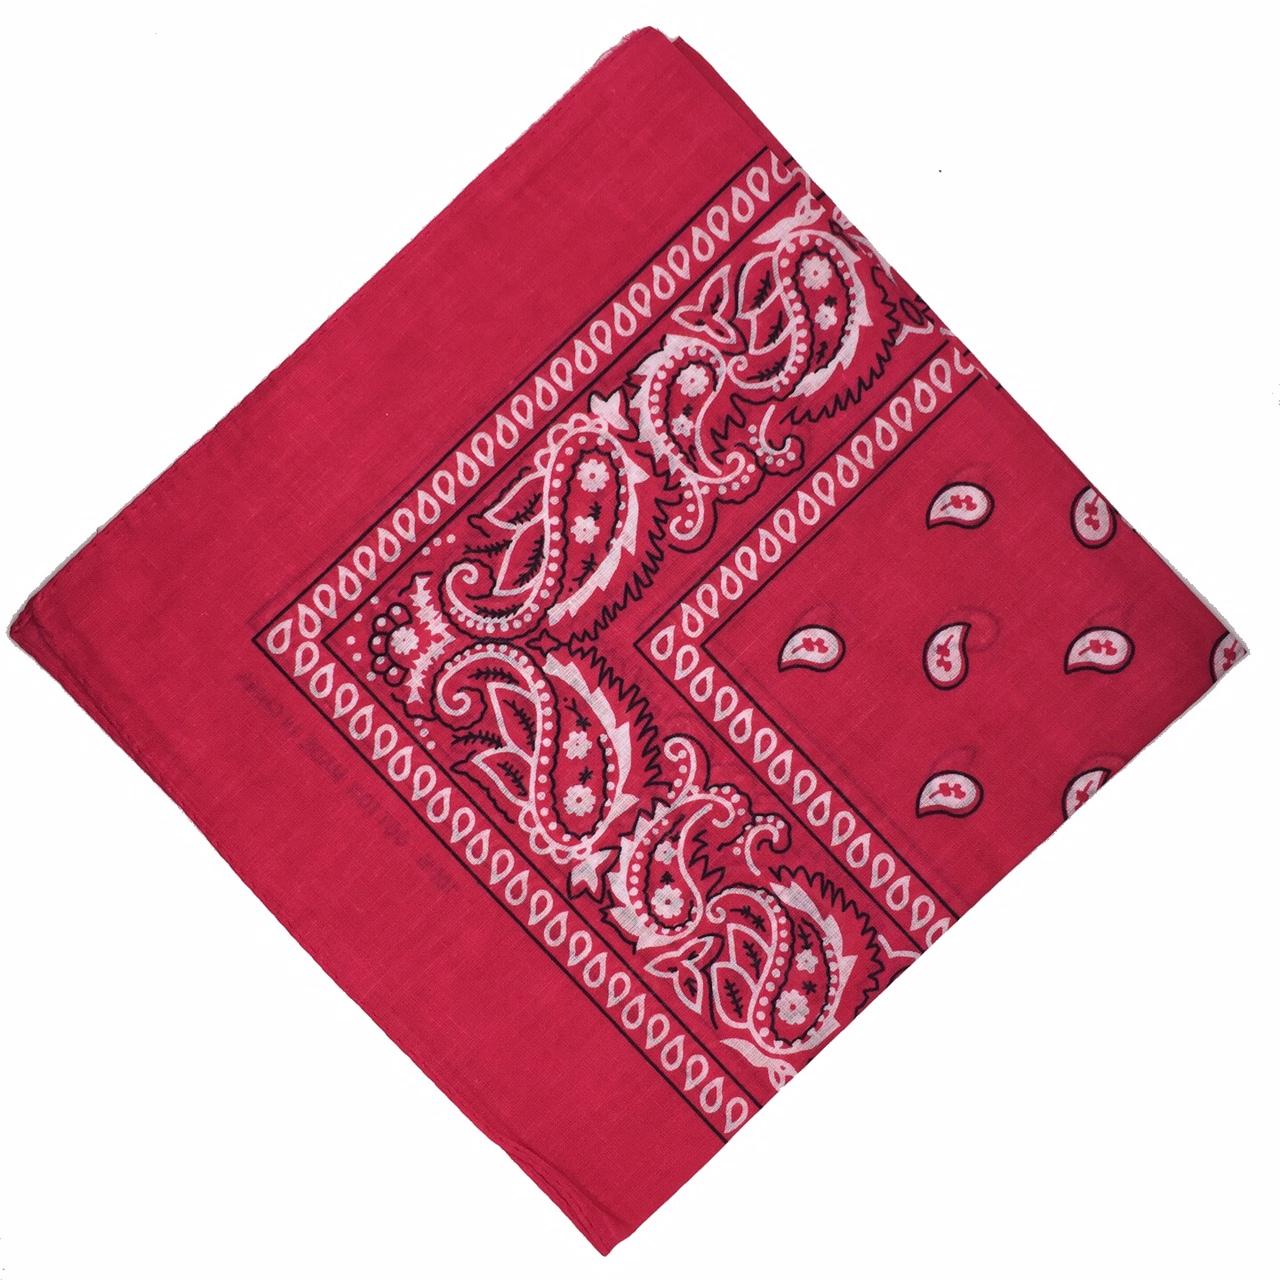 100-Cotton-Paisley-Bandana-Bandanna-Headwear-Scarf-Neck-Wrist-Wrap-Band-Headtie thumbnail 61